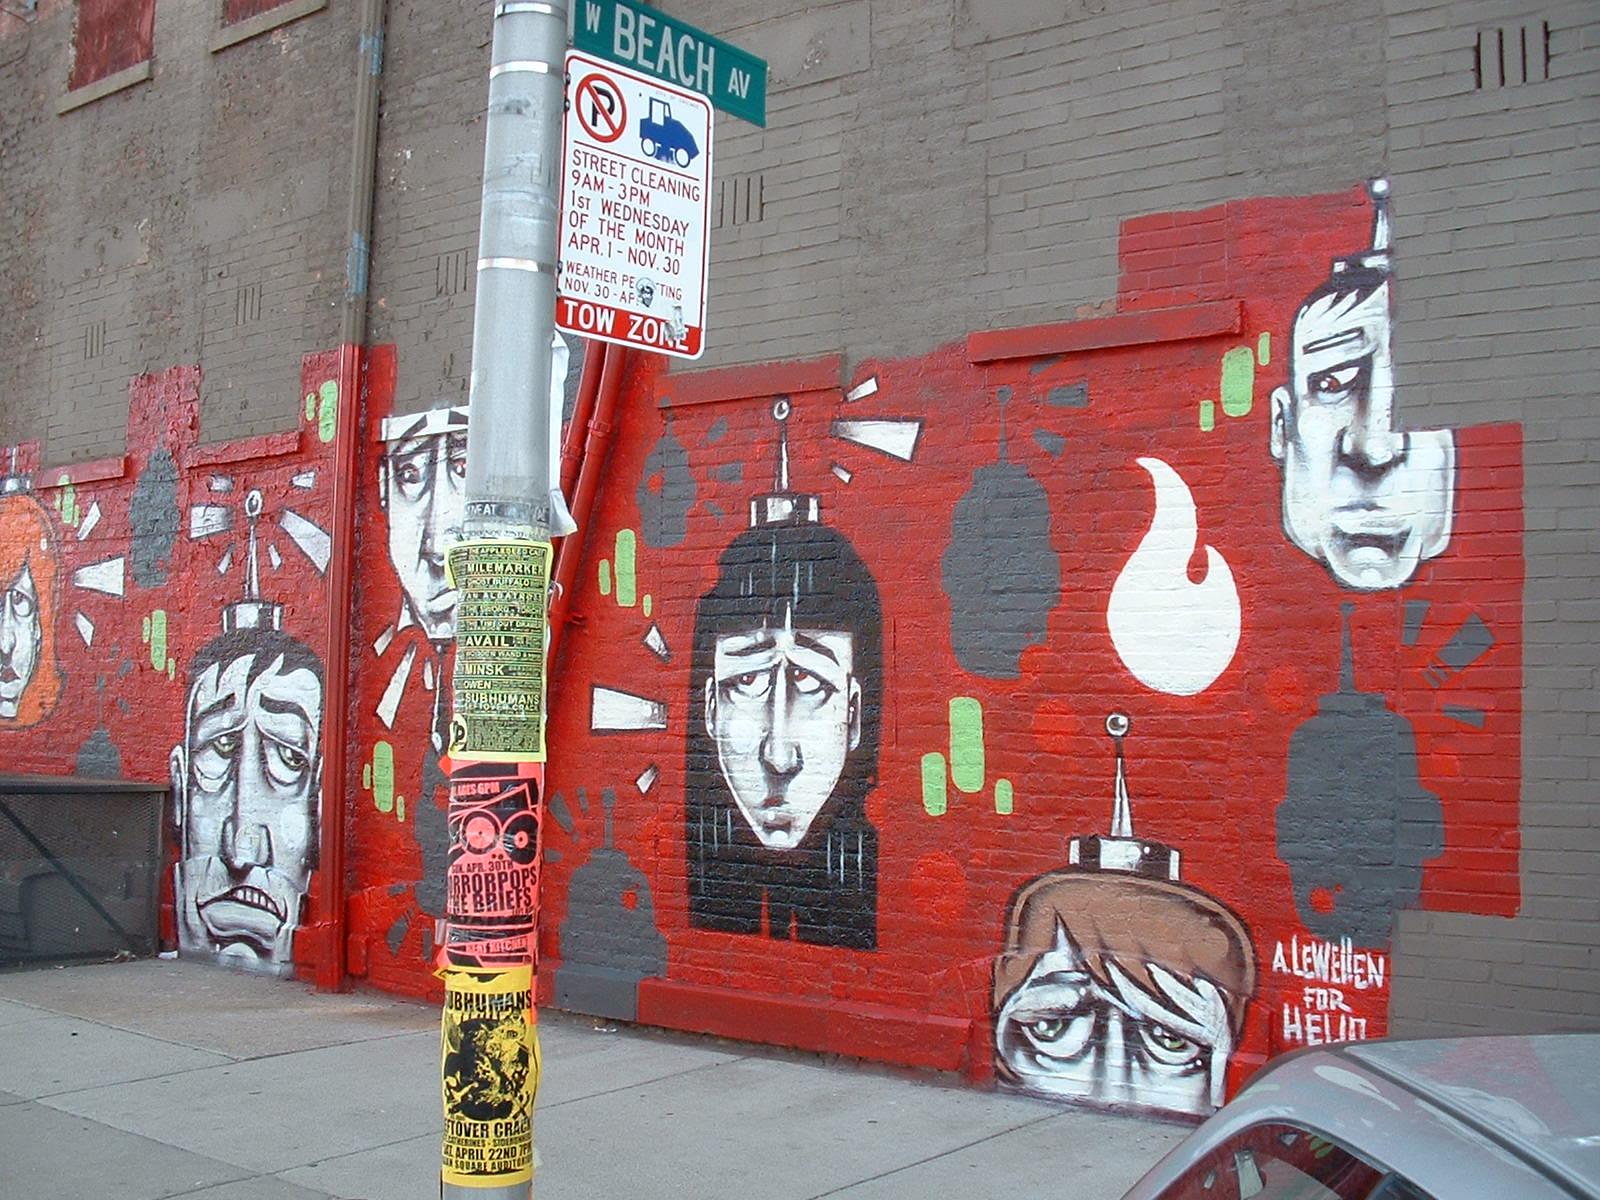 Helio Mural Chicago